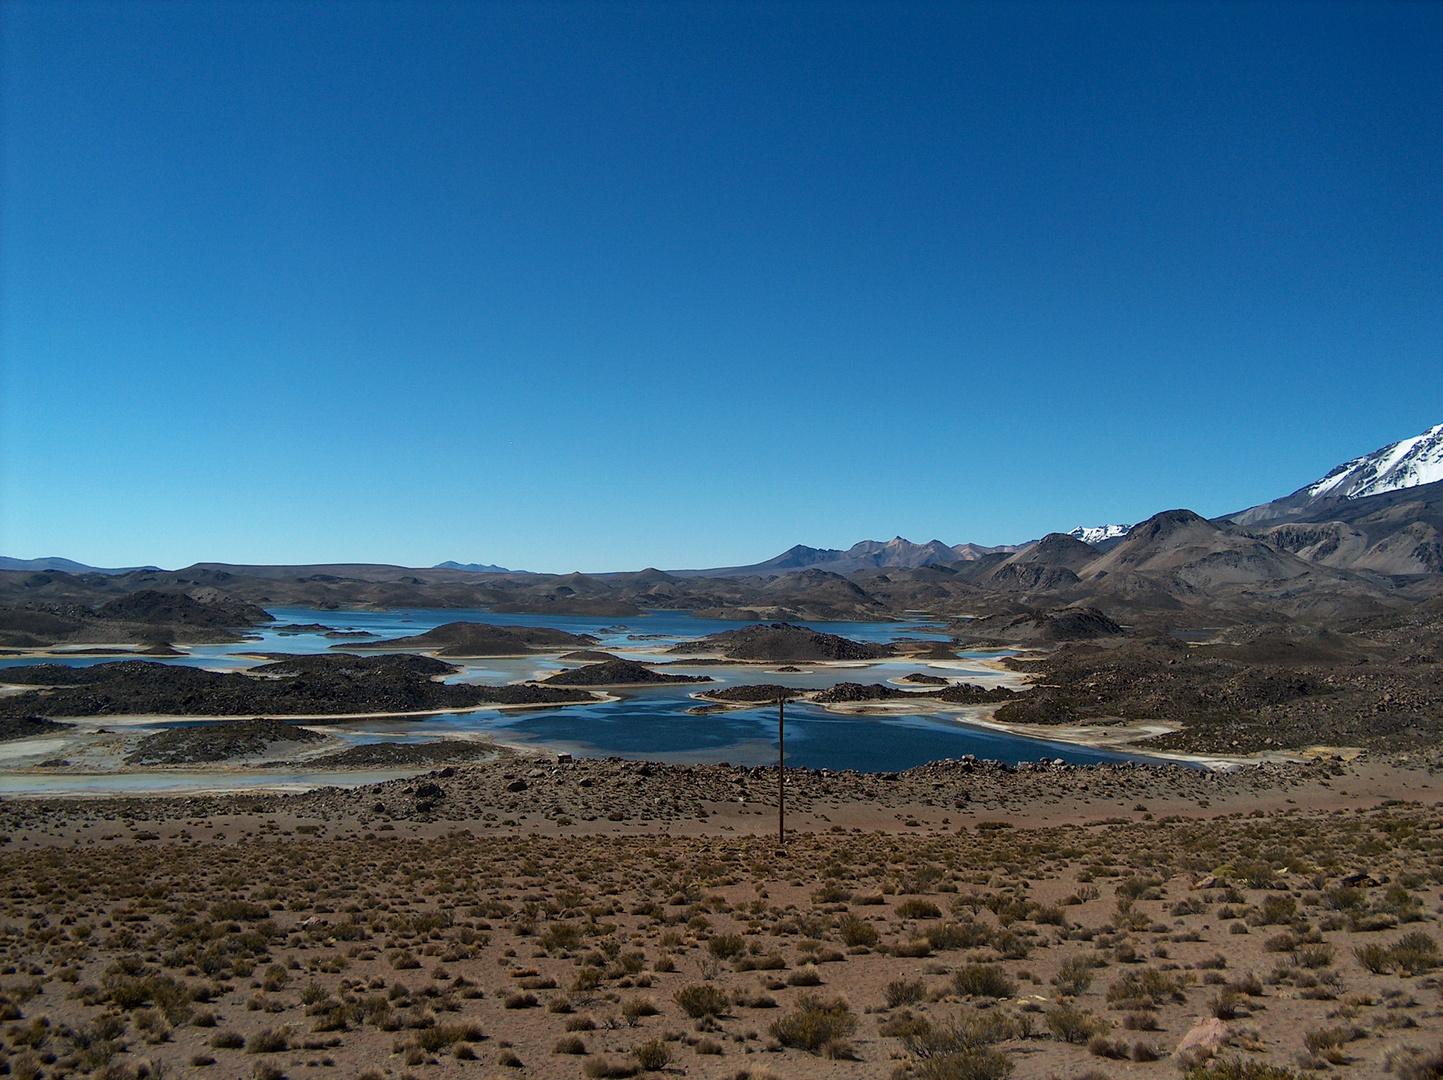 Lagune oltre i 4000 metri tra Cile e Bolivia